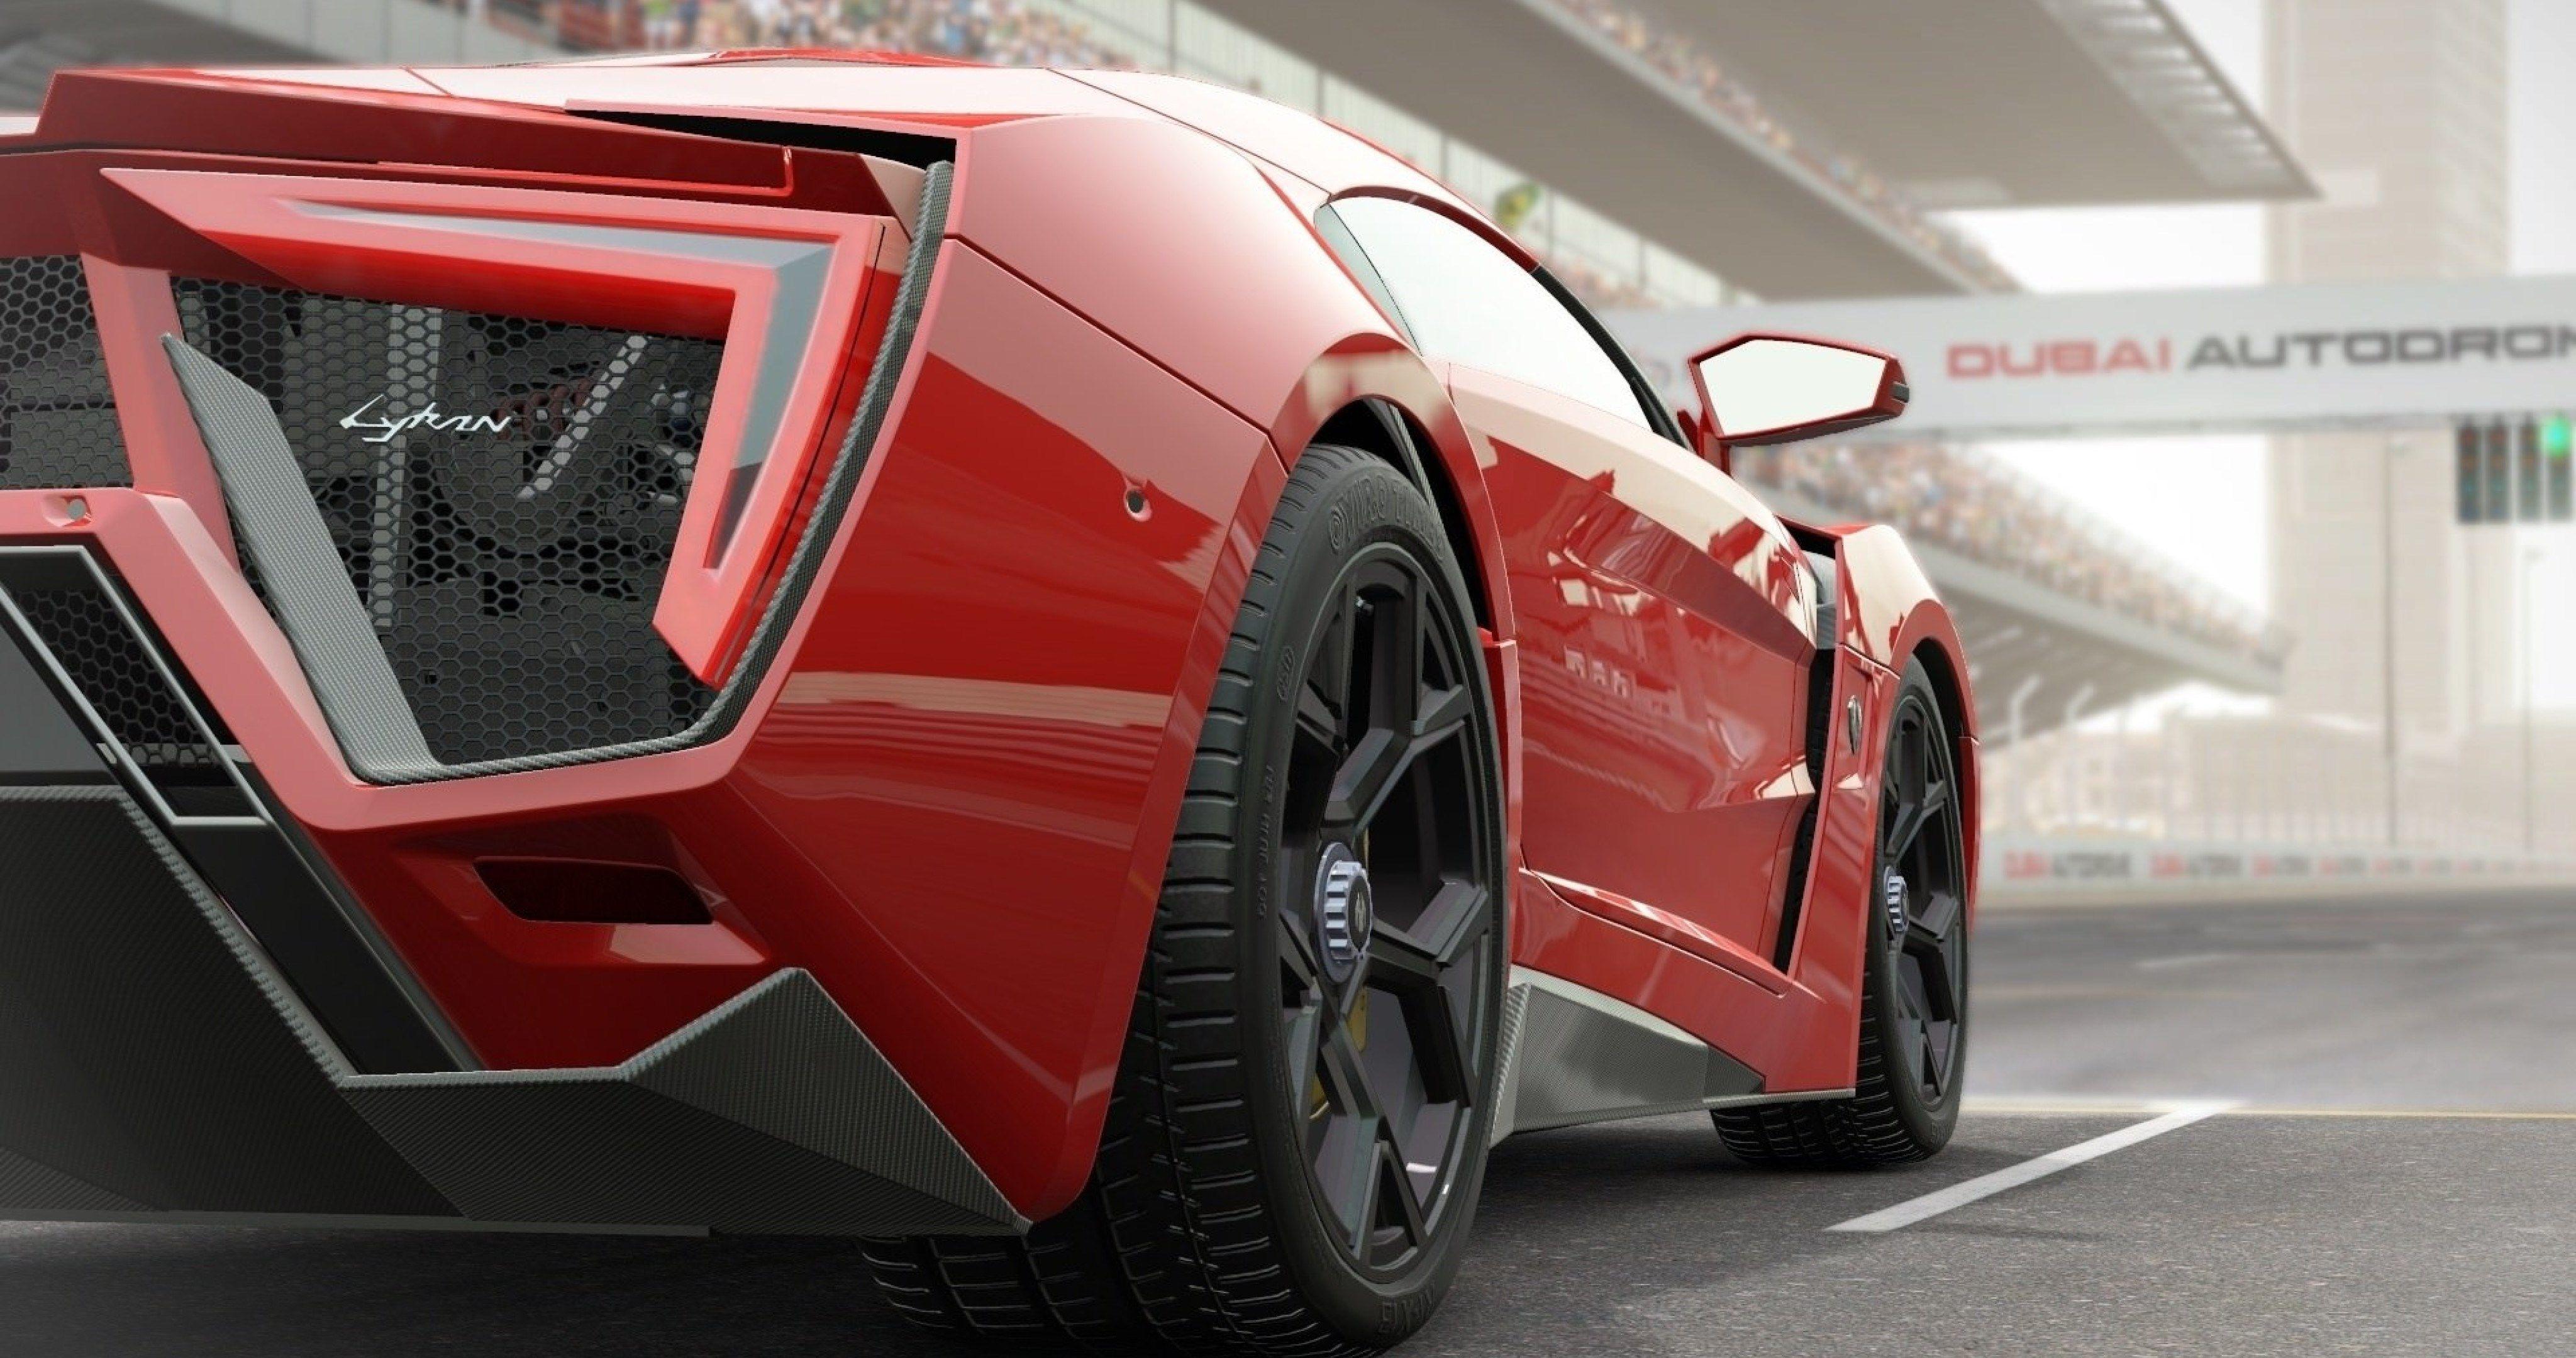 4k Ultra Hd Car Wallpapers Top Free 4k Ultra Hd Car Backgrounds Wallpaperaccess